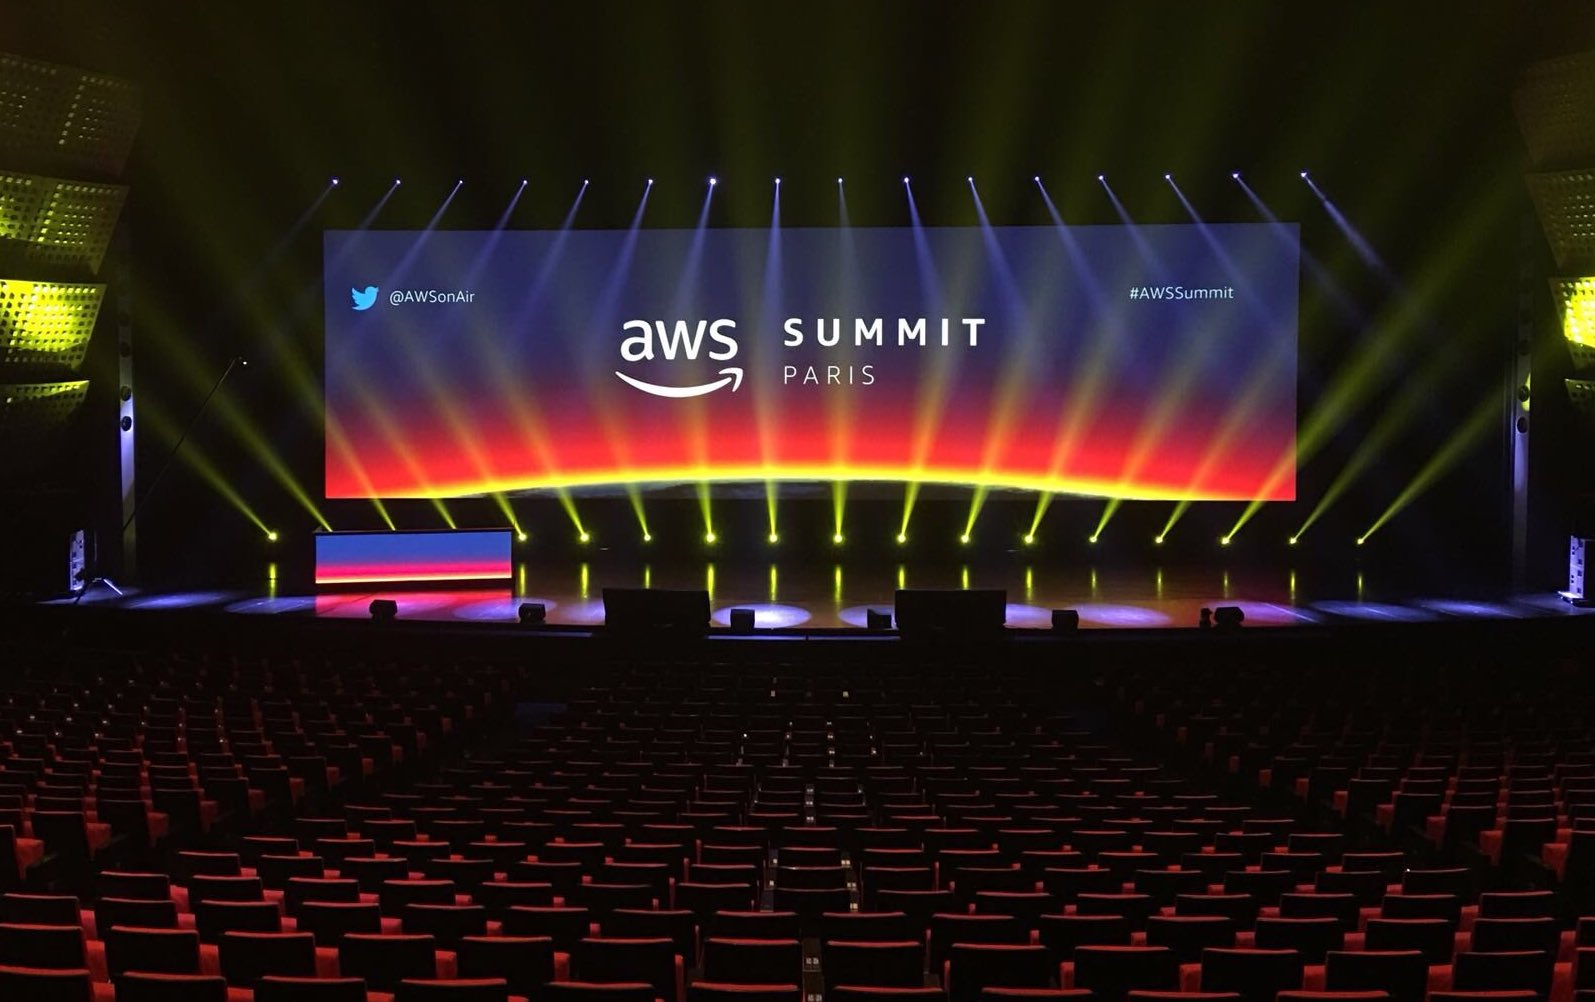 AWS Summit Paris 2018